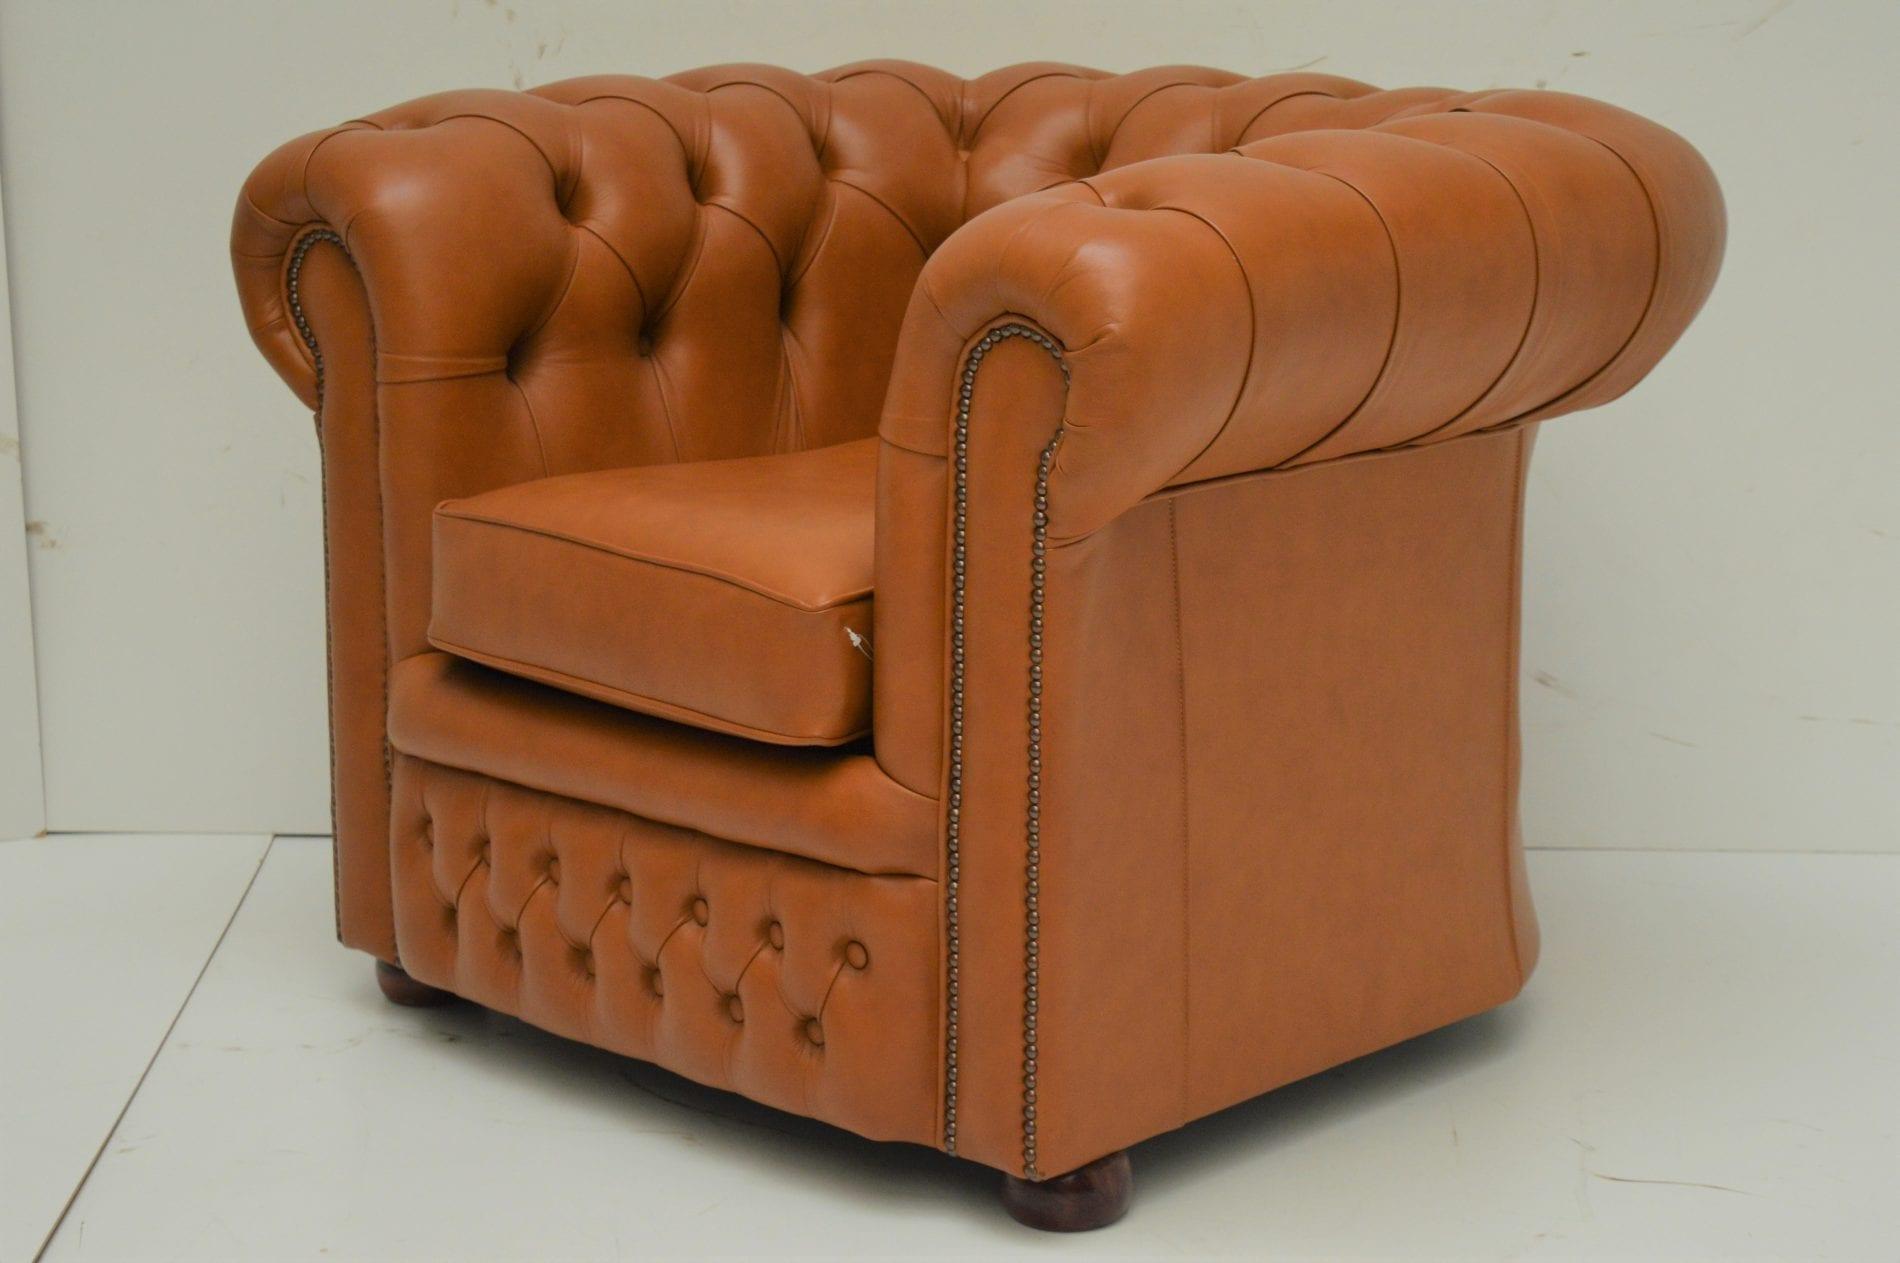 Gebruikte cognac kleurige Burnley chesterfield stoel